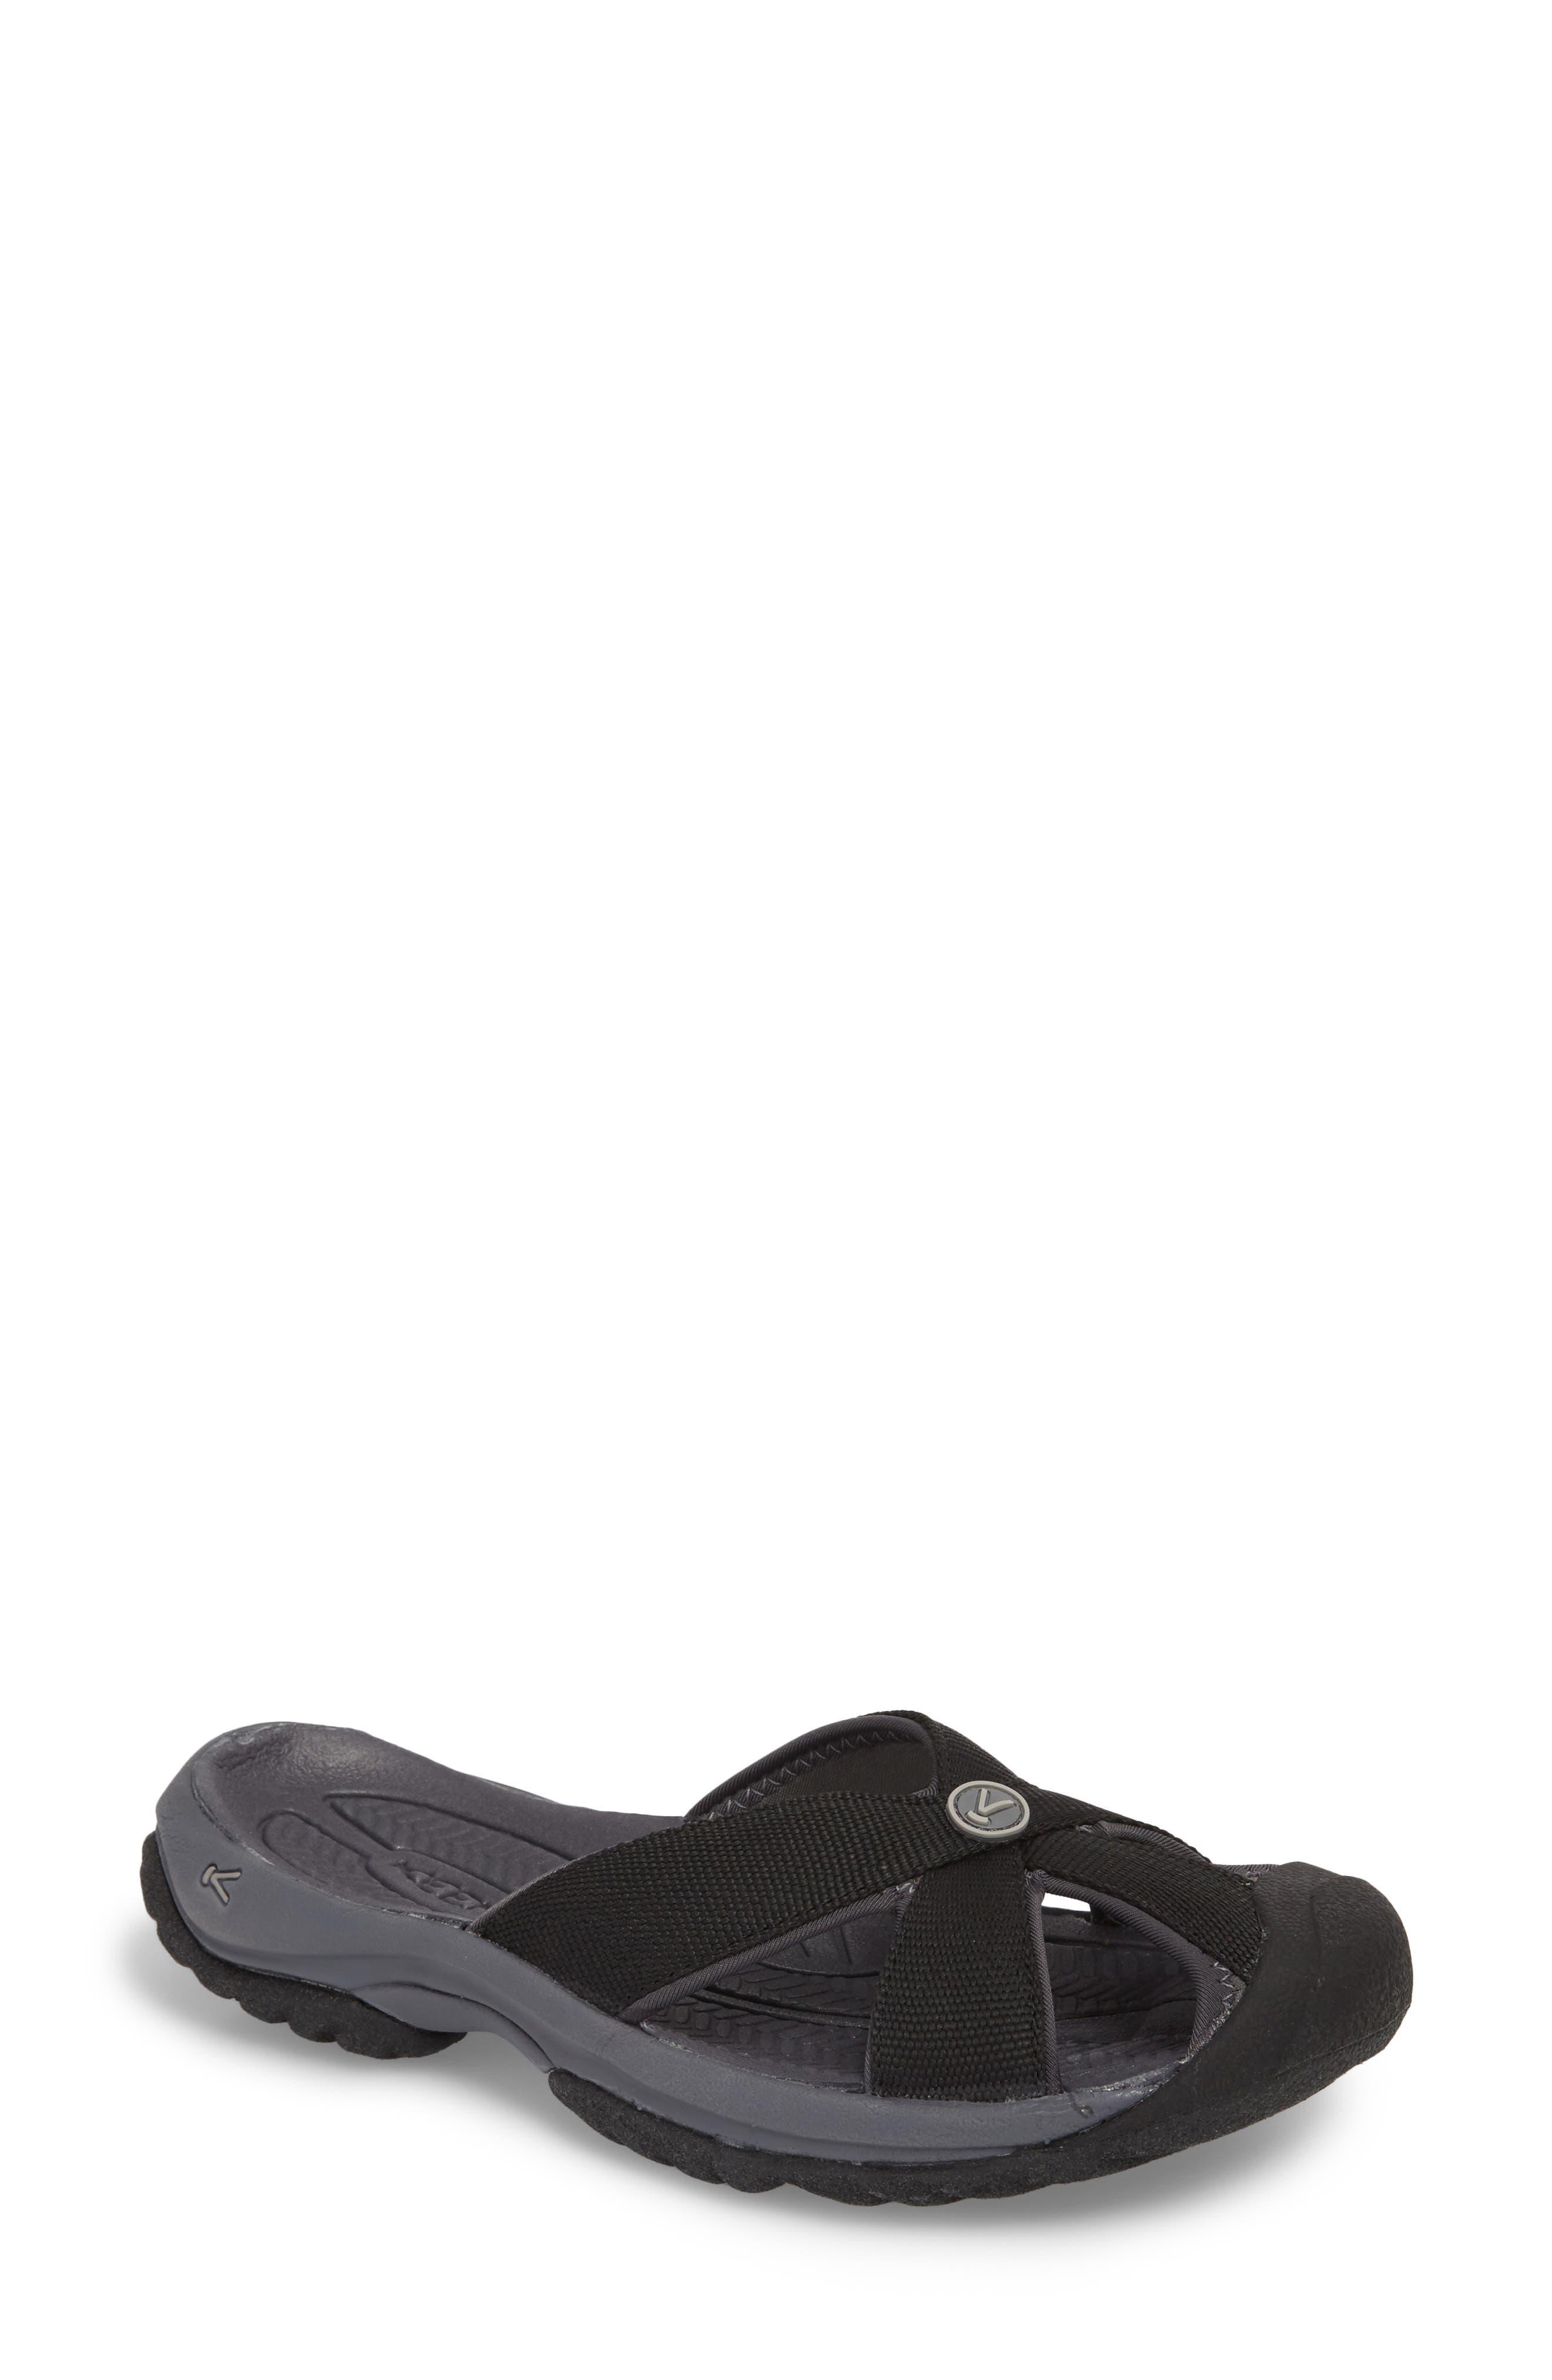 KEEN, 'Bali' Sandal, Main thumbnail 1, color, BLACK/ MAGNET